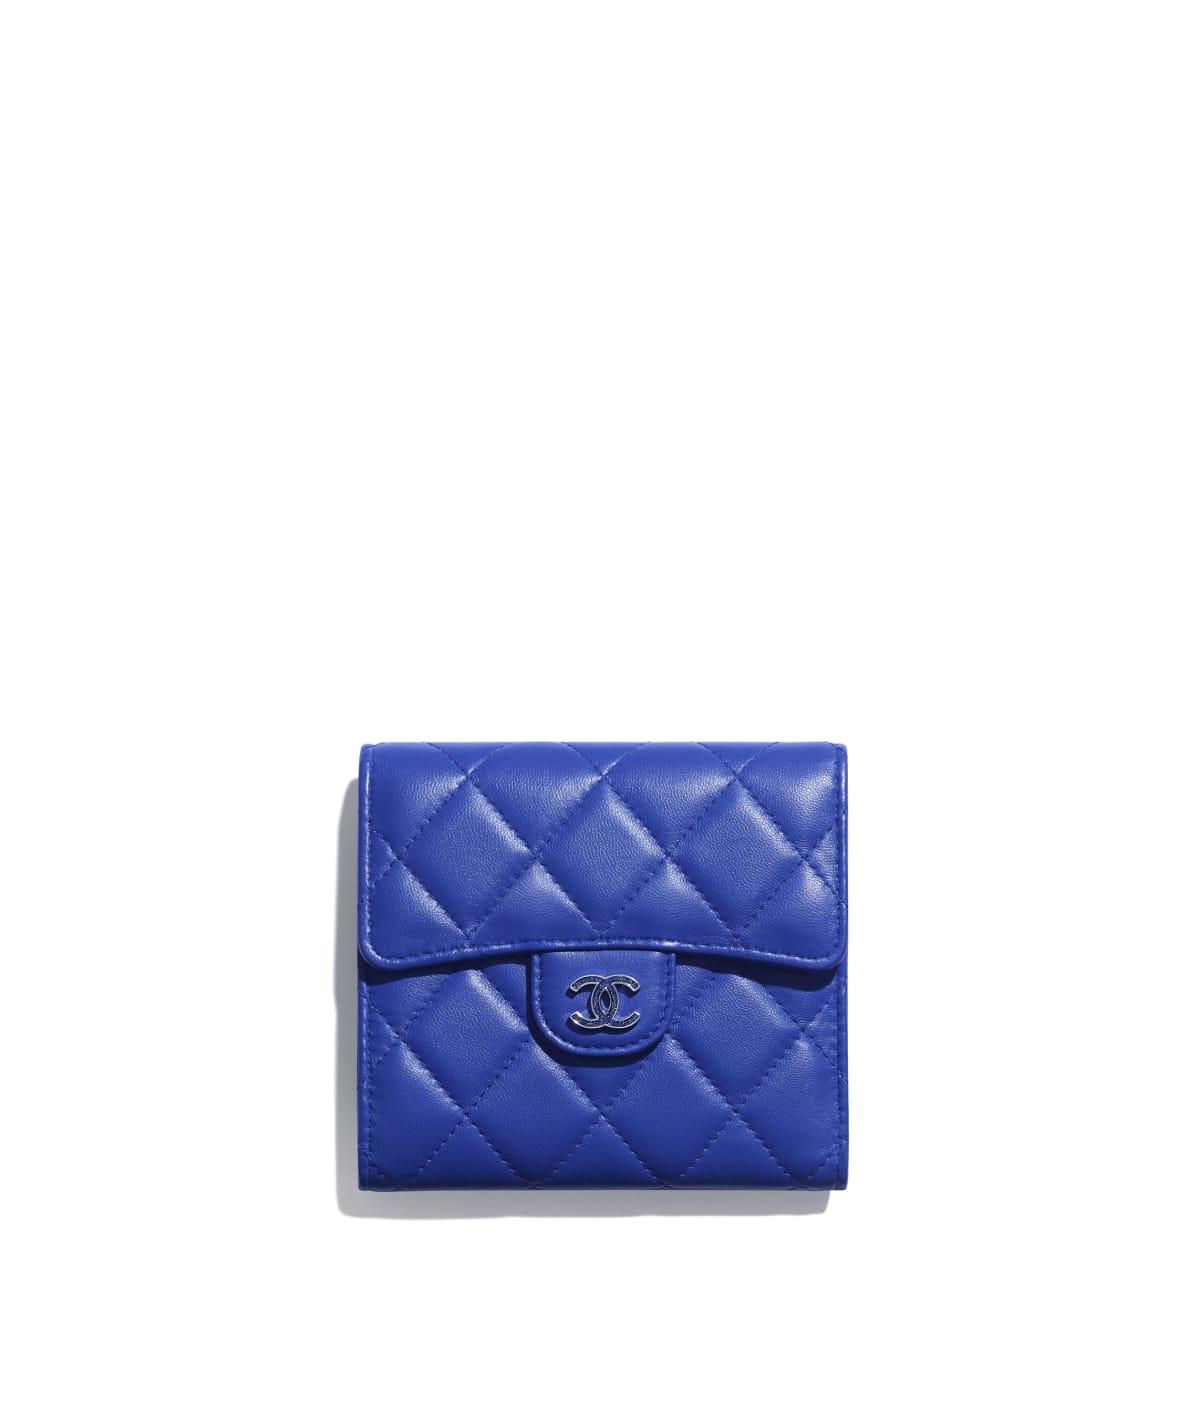 9f05e5c0fa444b Classic Small Flap Wallet, lambskin & lacquered silver-tone metal, dark  blue - CHANEL